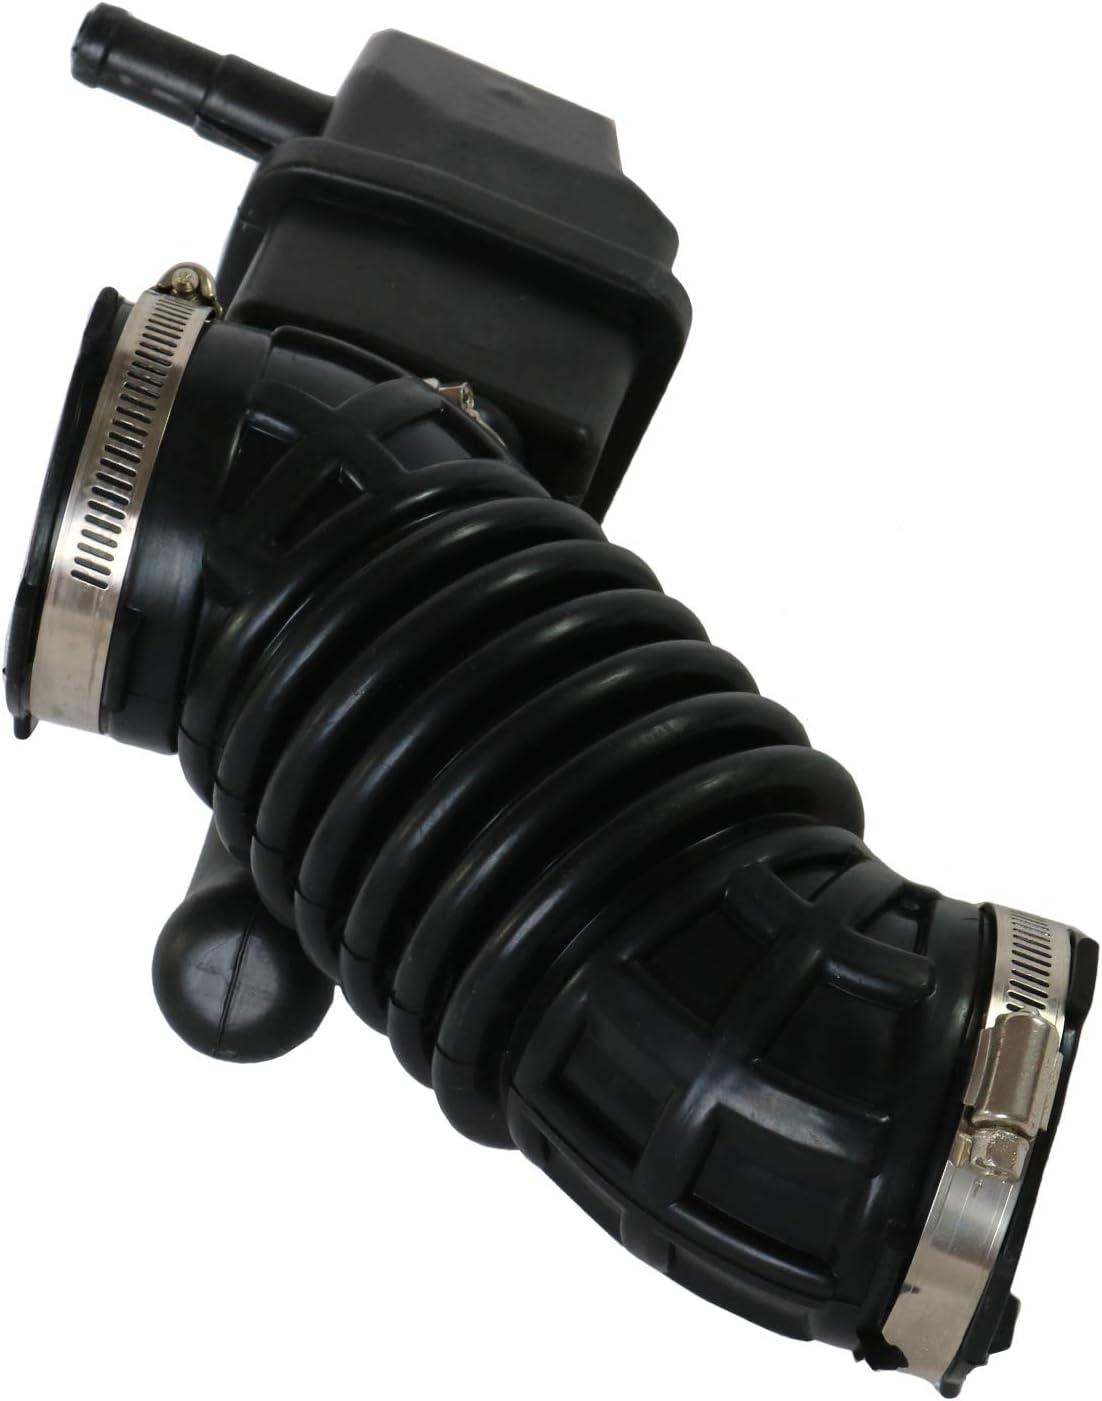 JDMSPEED New Engine Air Intake Hose /& Upper Duct For 07-12 Nissan Sentra 2.0 2.5L 16576-ET000